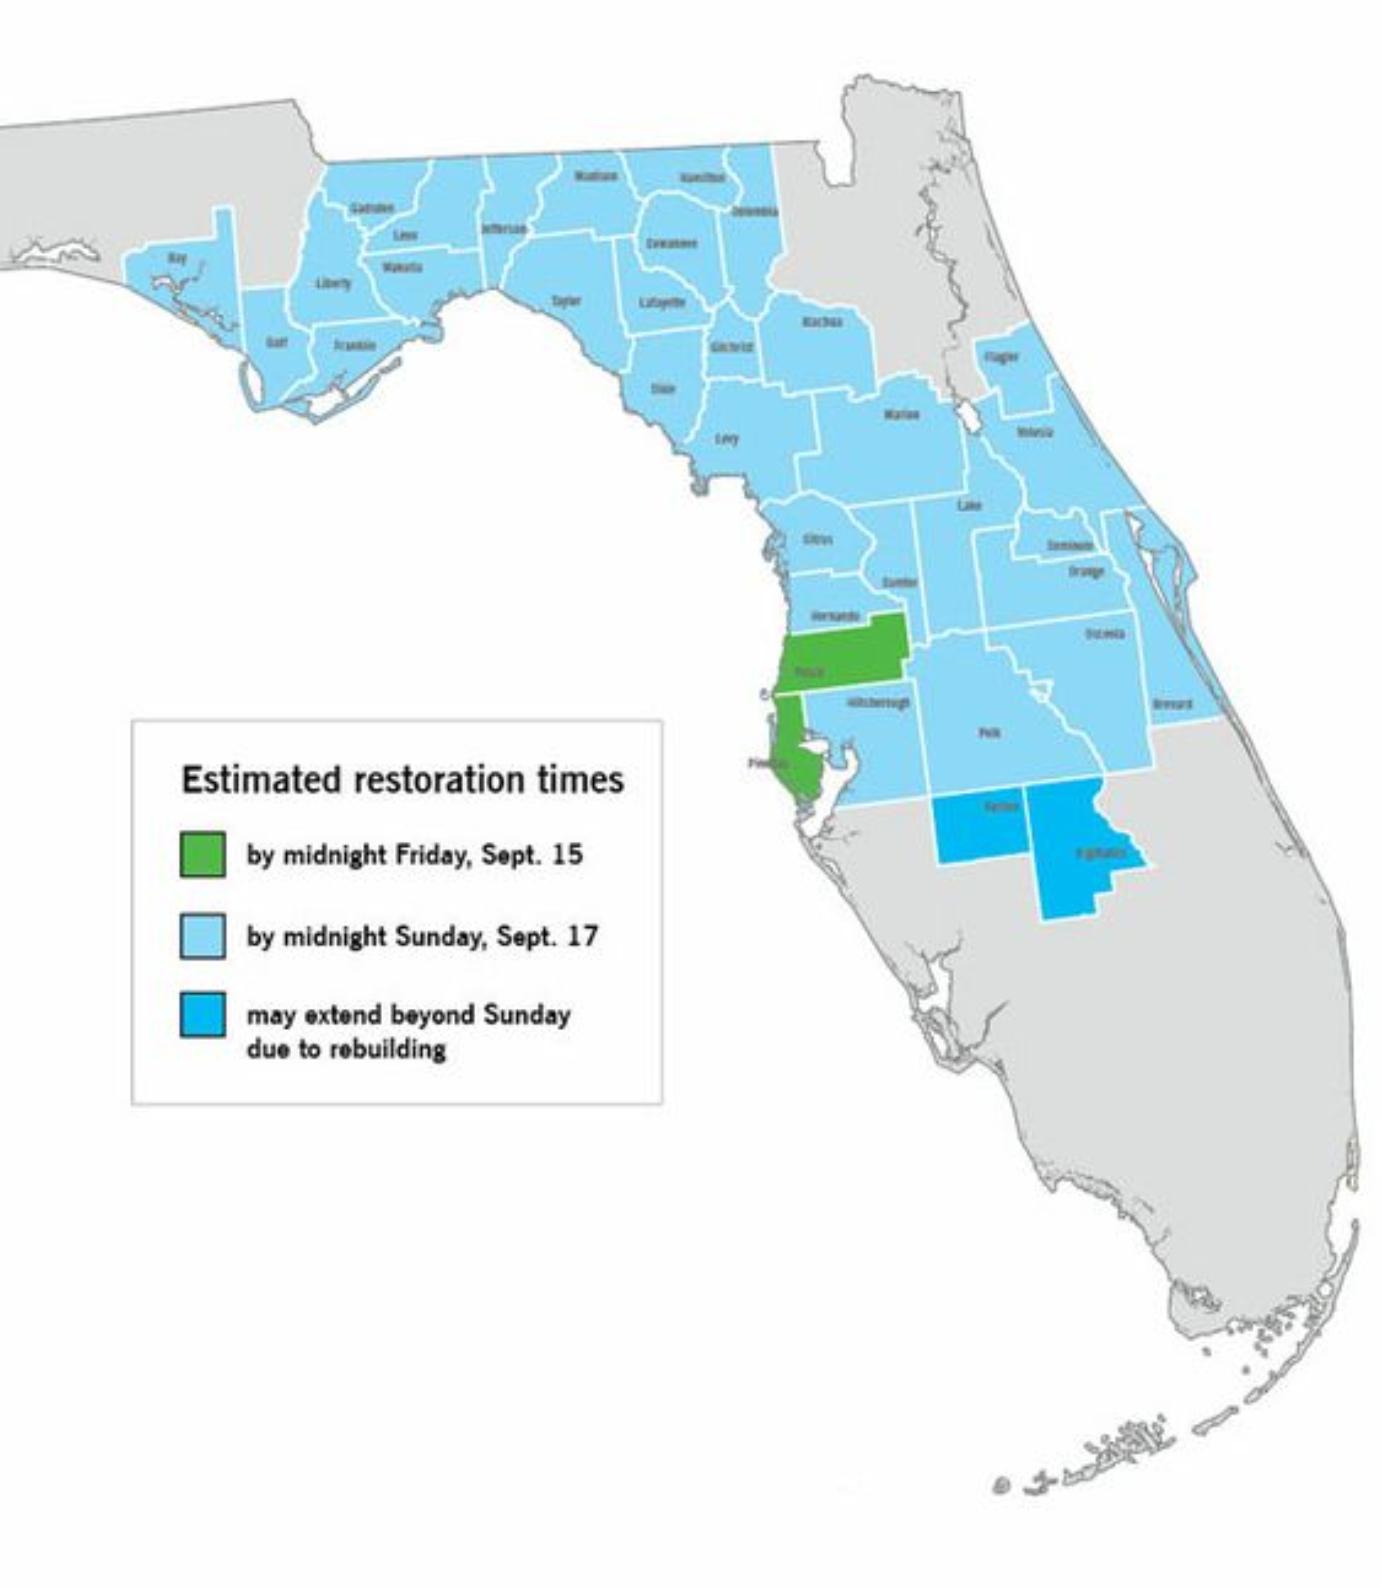 So I Just Got This From Duke Energy : Orlando - Duke Energy Transmission Lines Map Florida